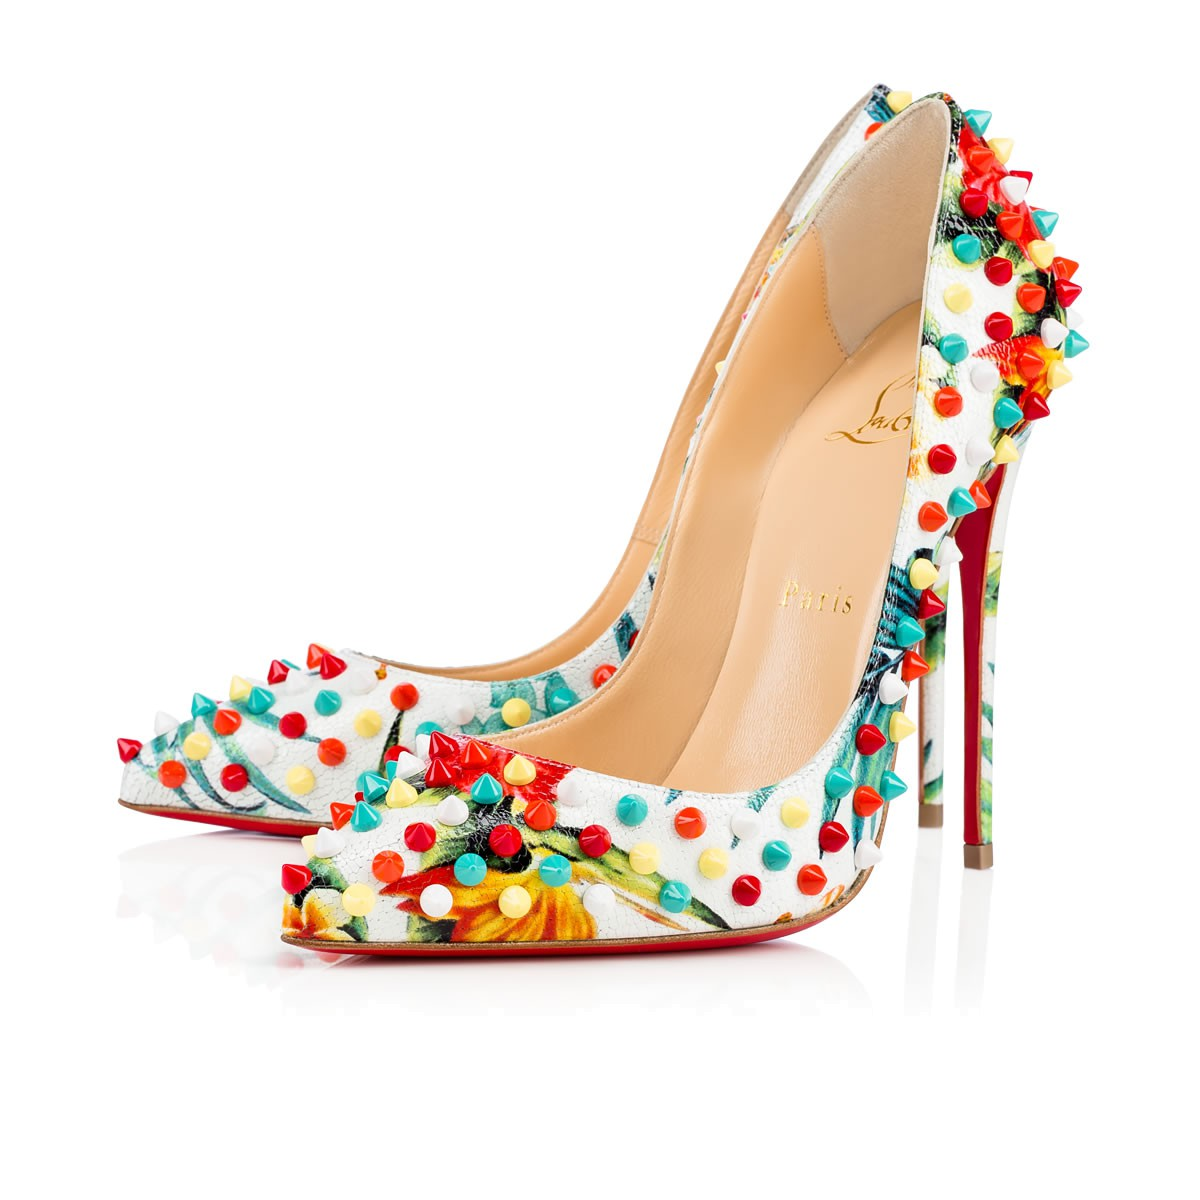 Туфли лабутены, модель Follies Spikes